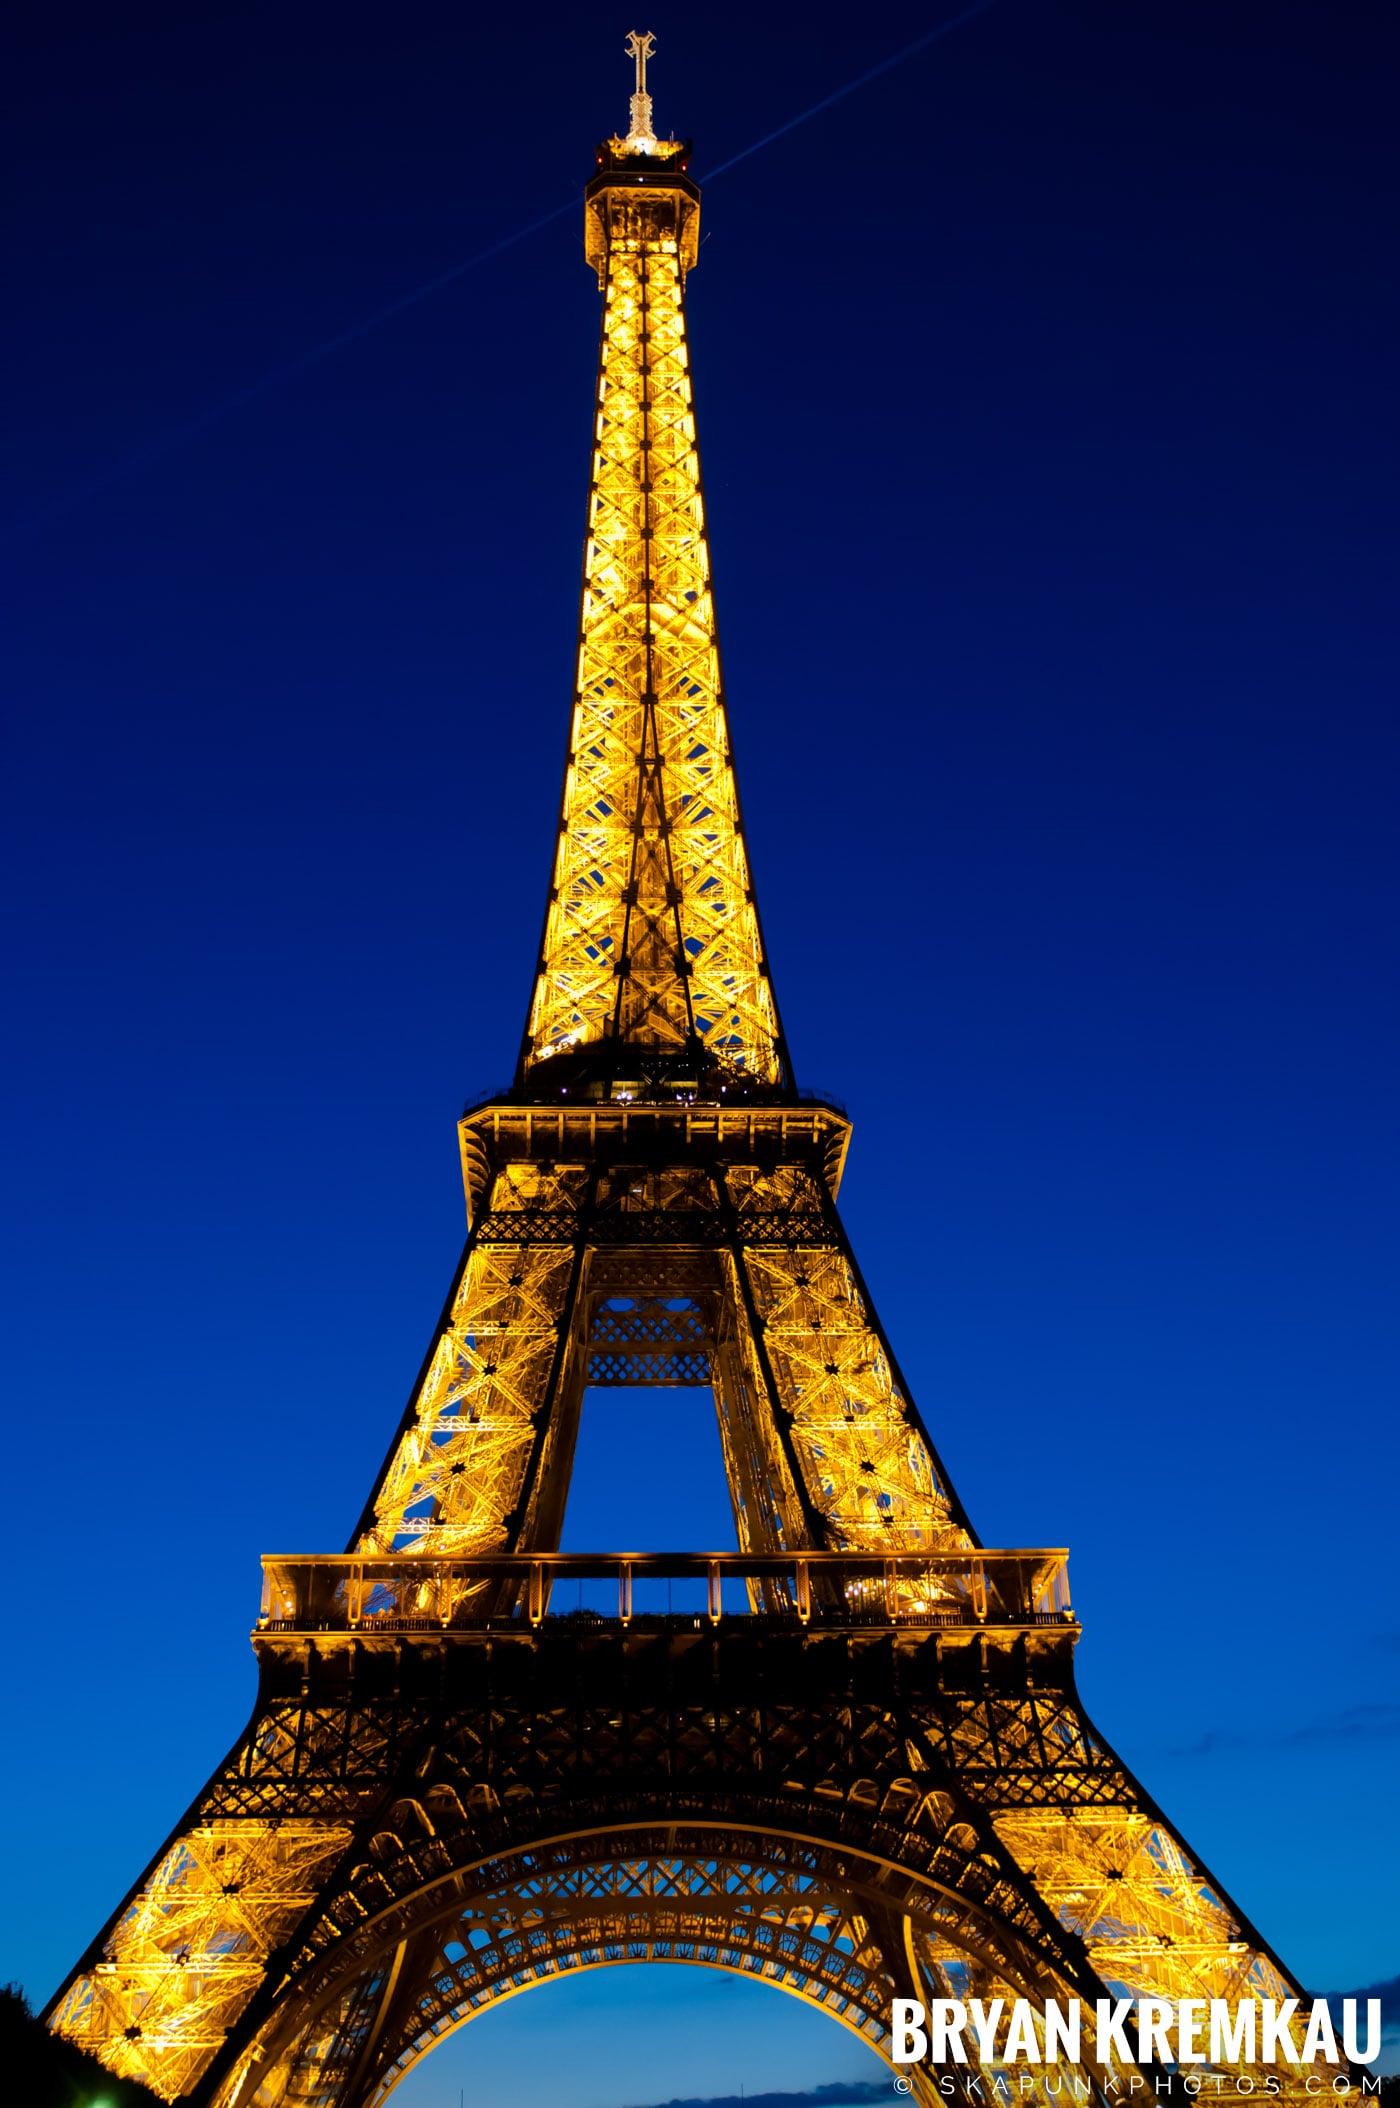 Paris, France Honeymoon - Day 5 - 7.22.11 (17)